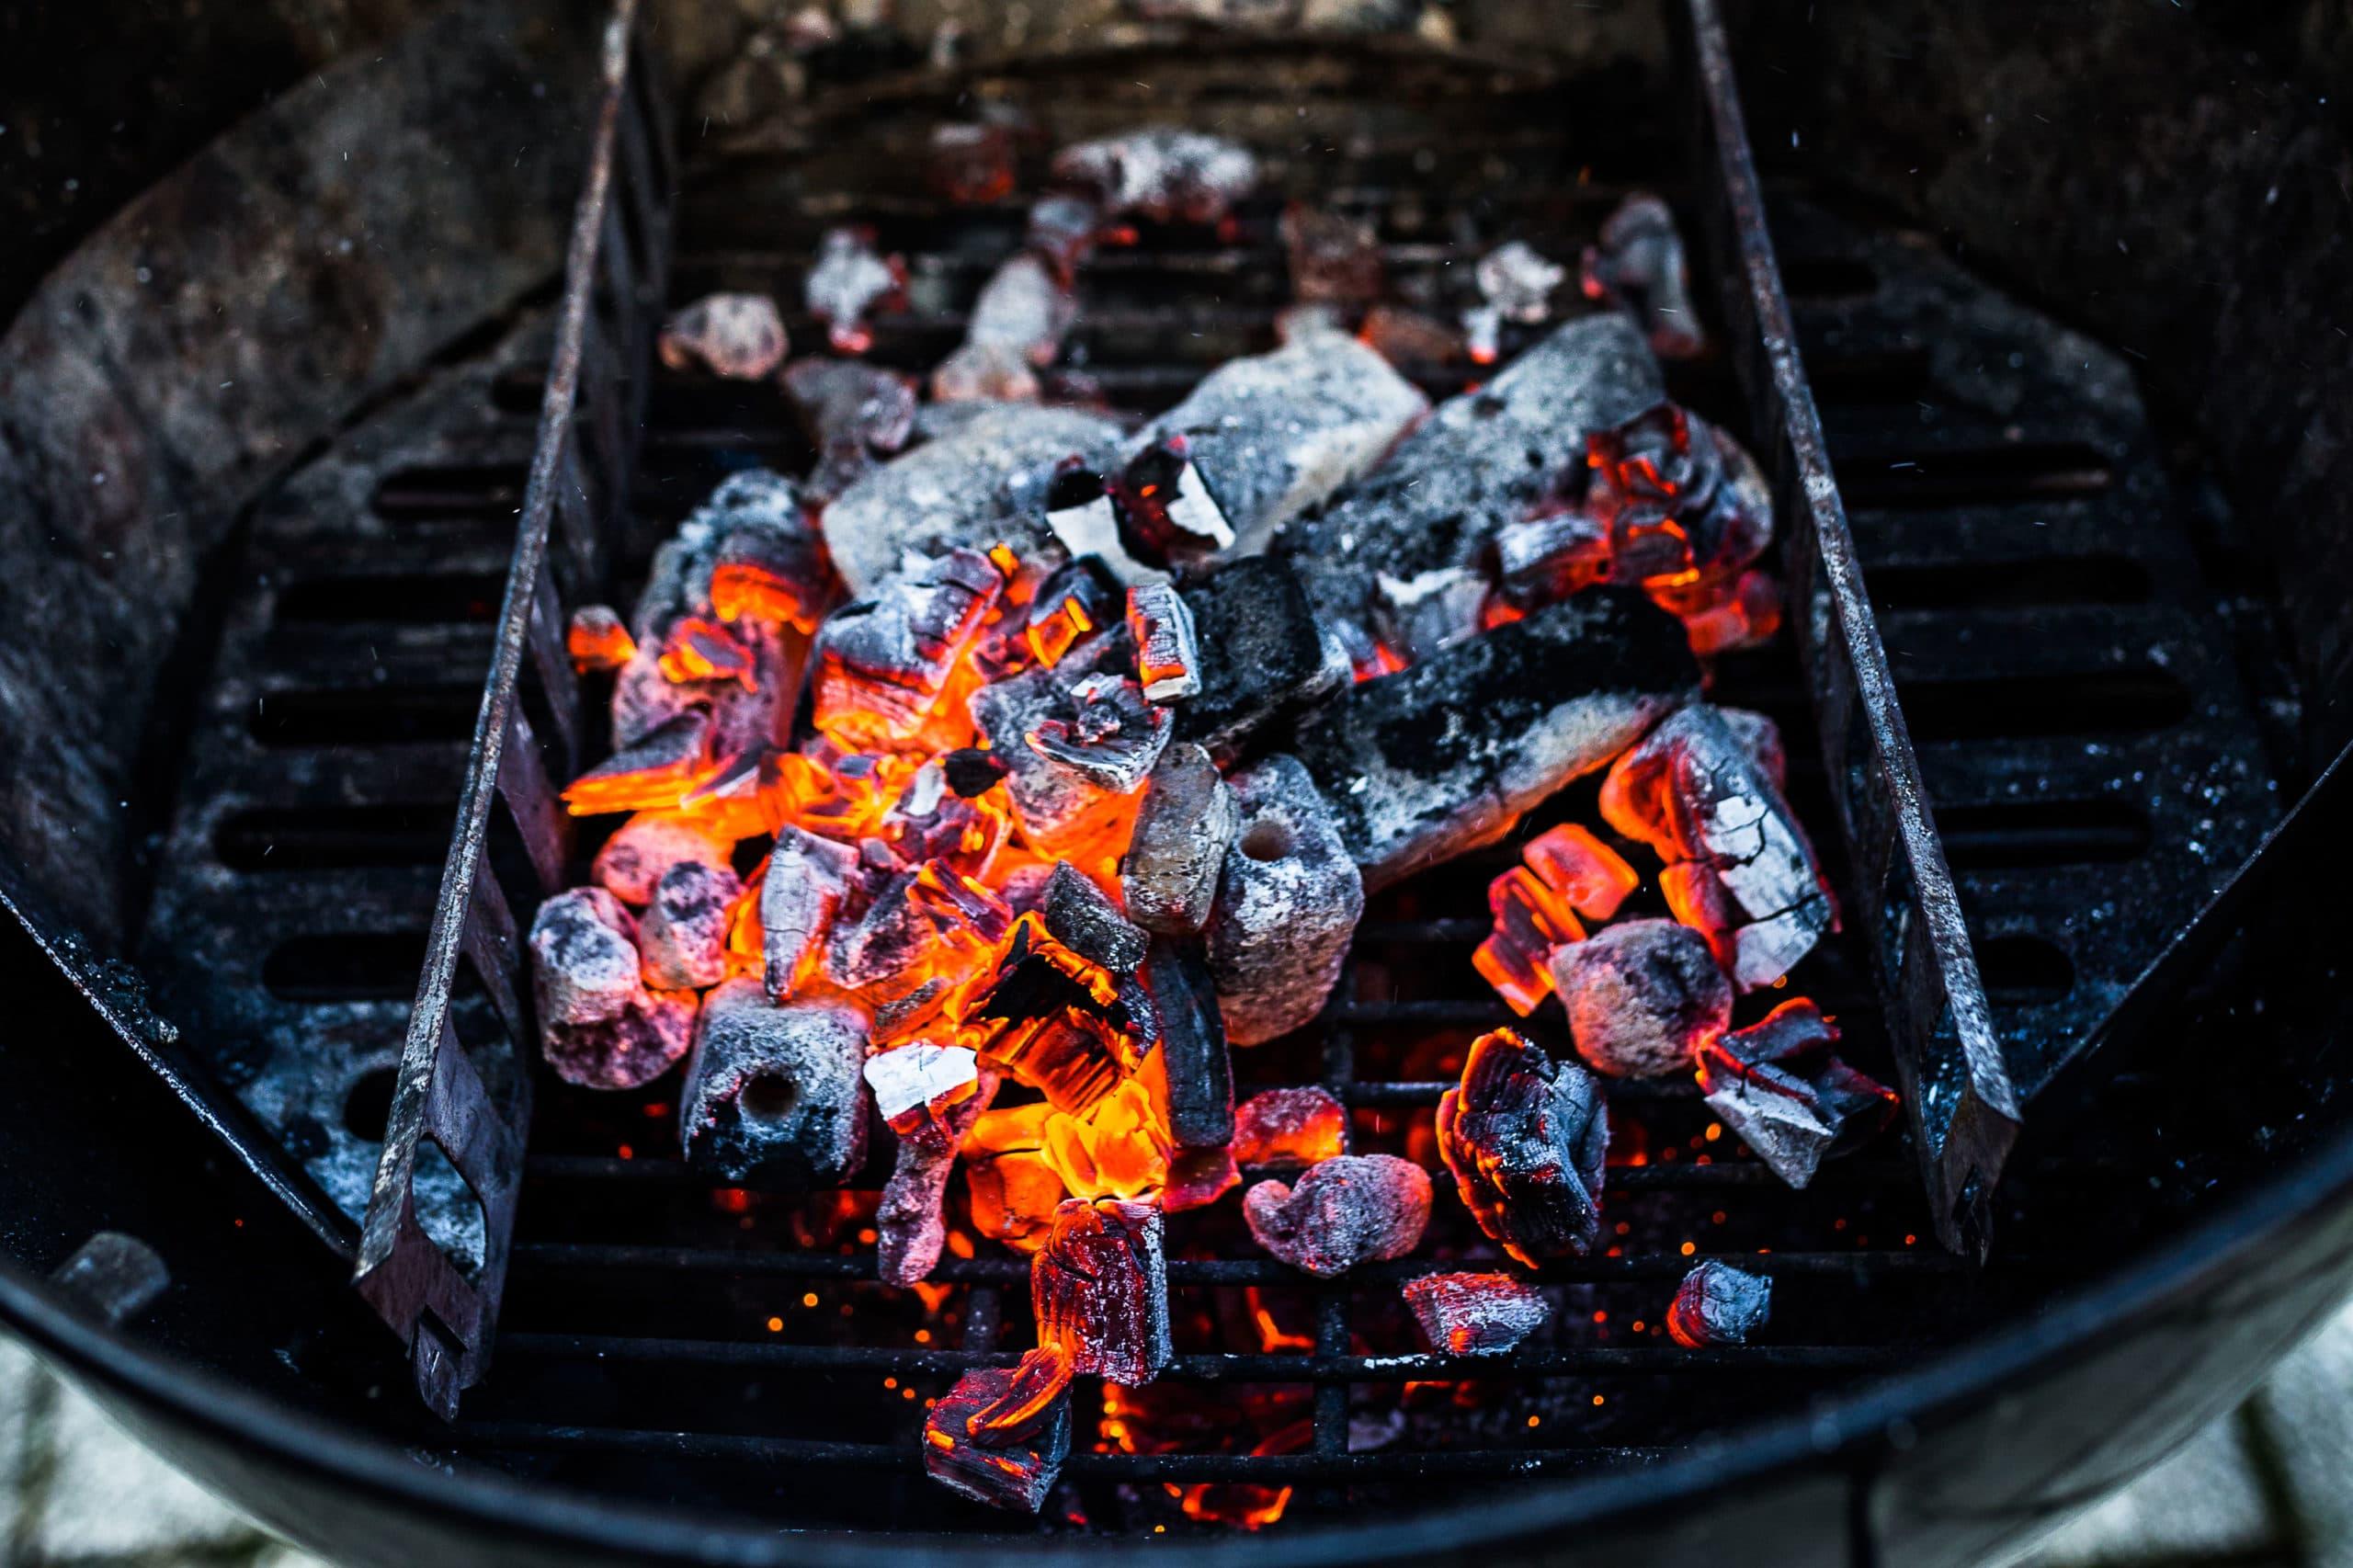 Holzkohle – der Ratgeber zum Grillen mit Kohle